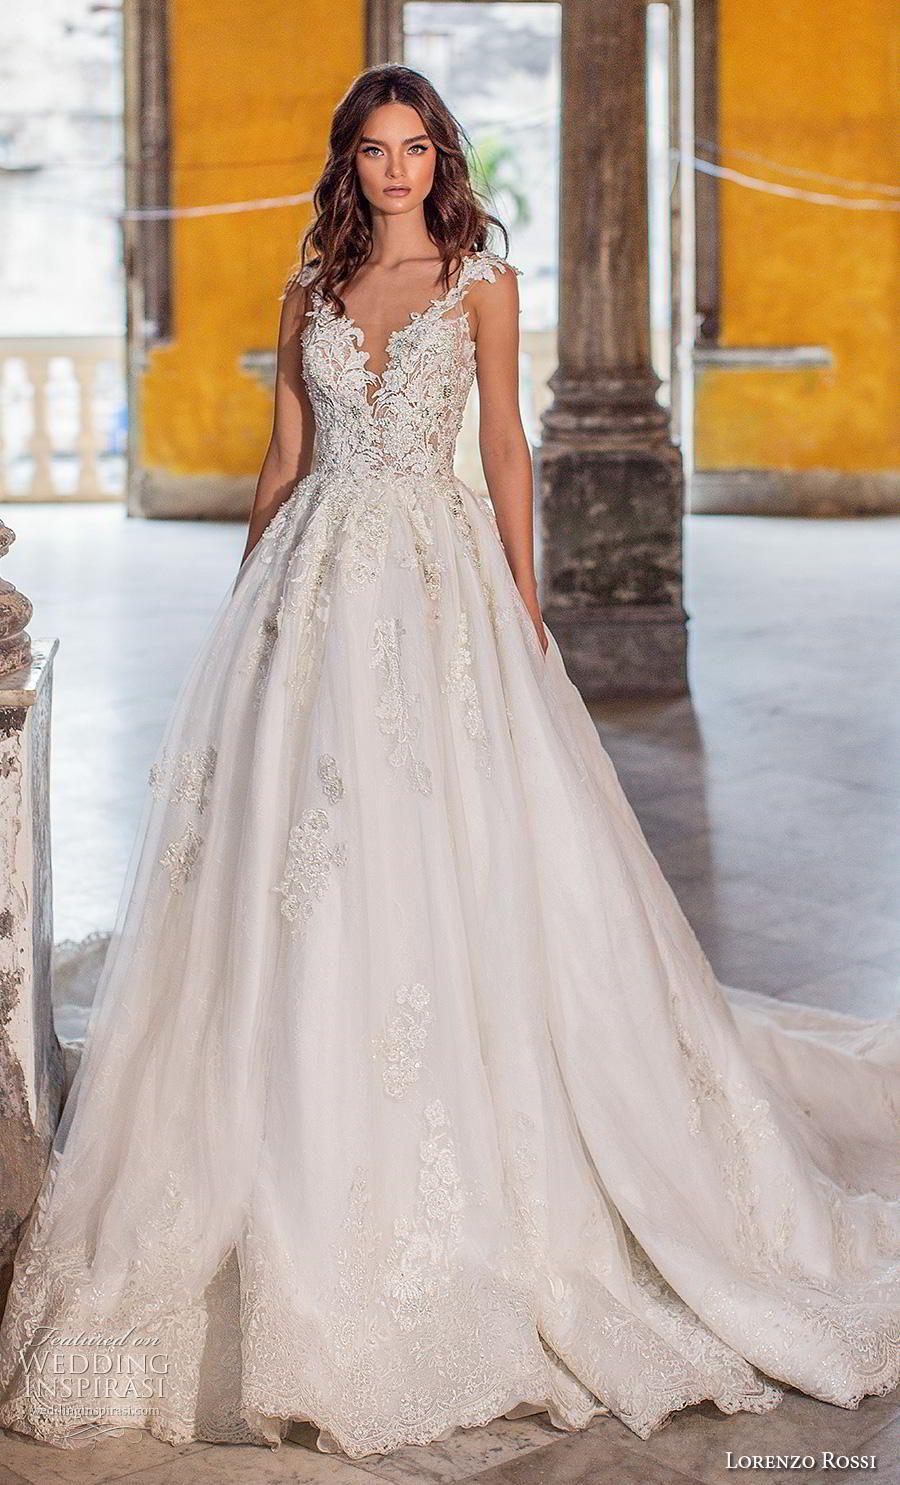 8933bd0284c lorenzo rossi 2018 bridal cap sleeves deep v neck heavily embellished  bodice glizty romantic princess a line wedding dress v back royal train (4)  mv ...